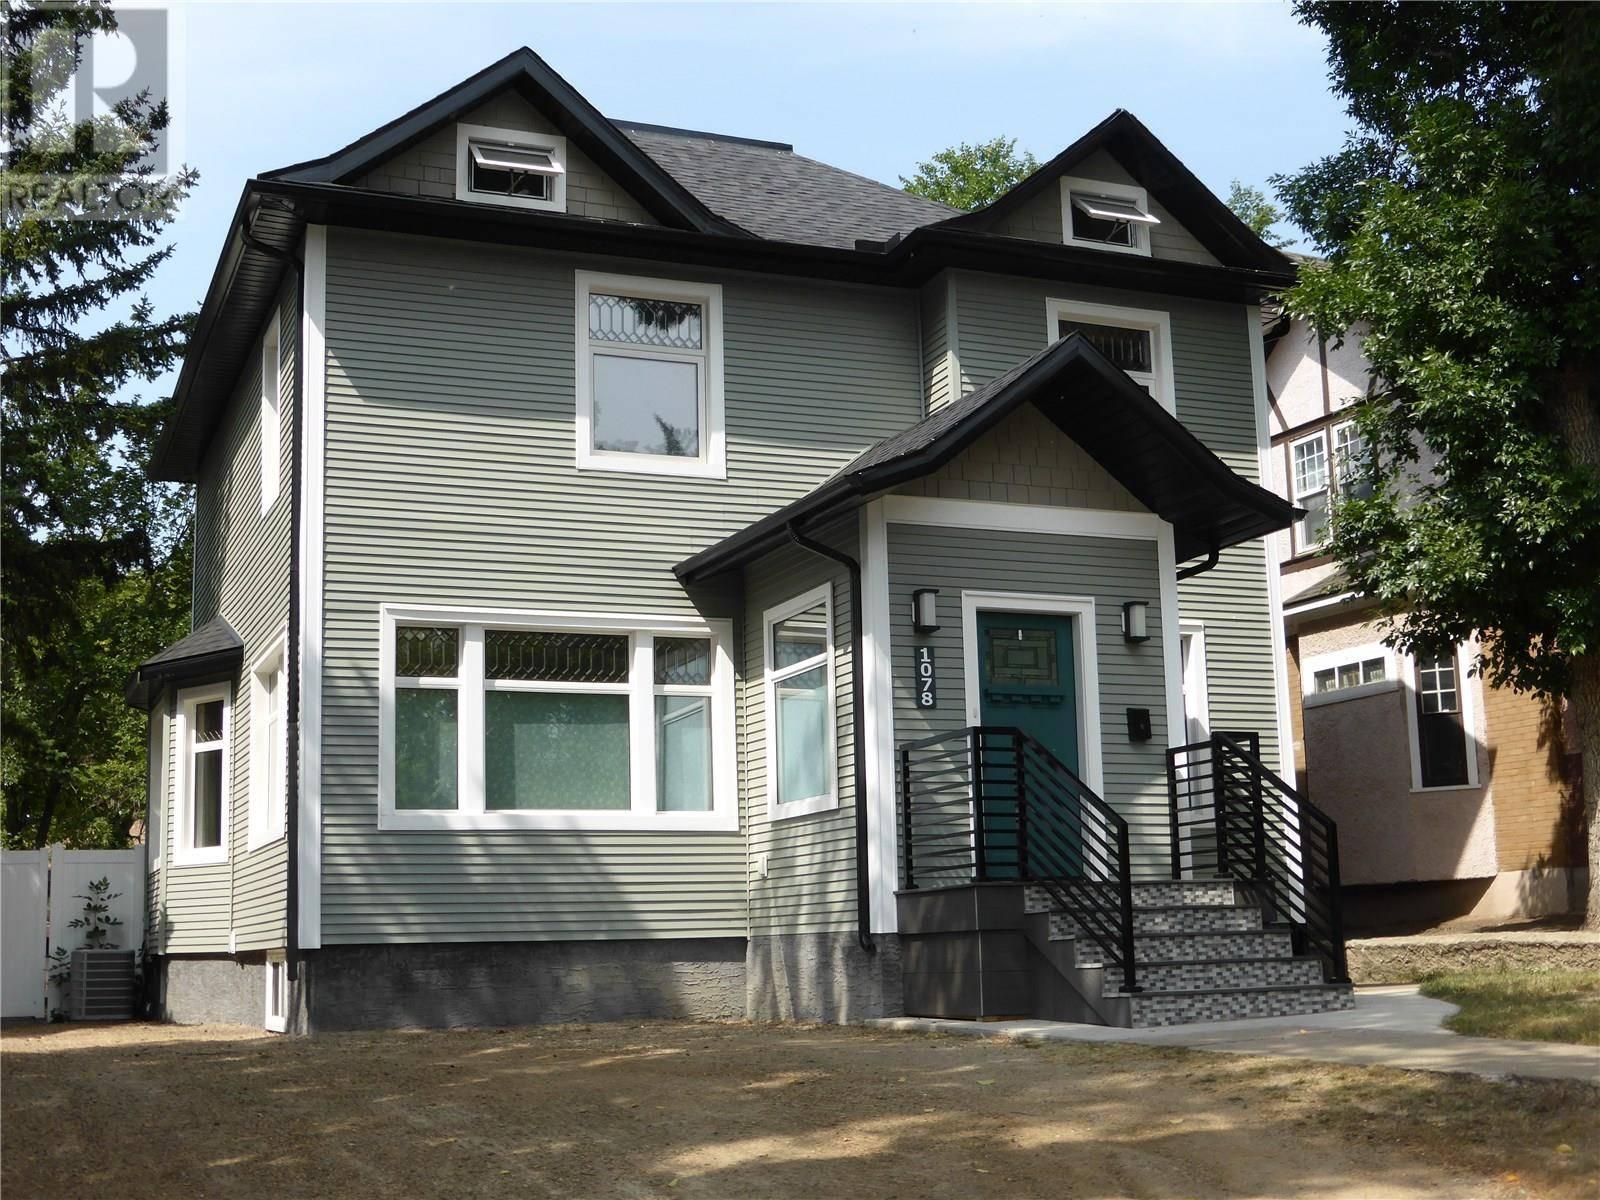 House for sale at 1078 1st Ave W Moose Jaw Saskatchewan - MLS: SK783347